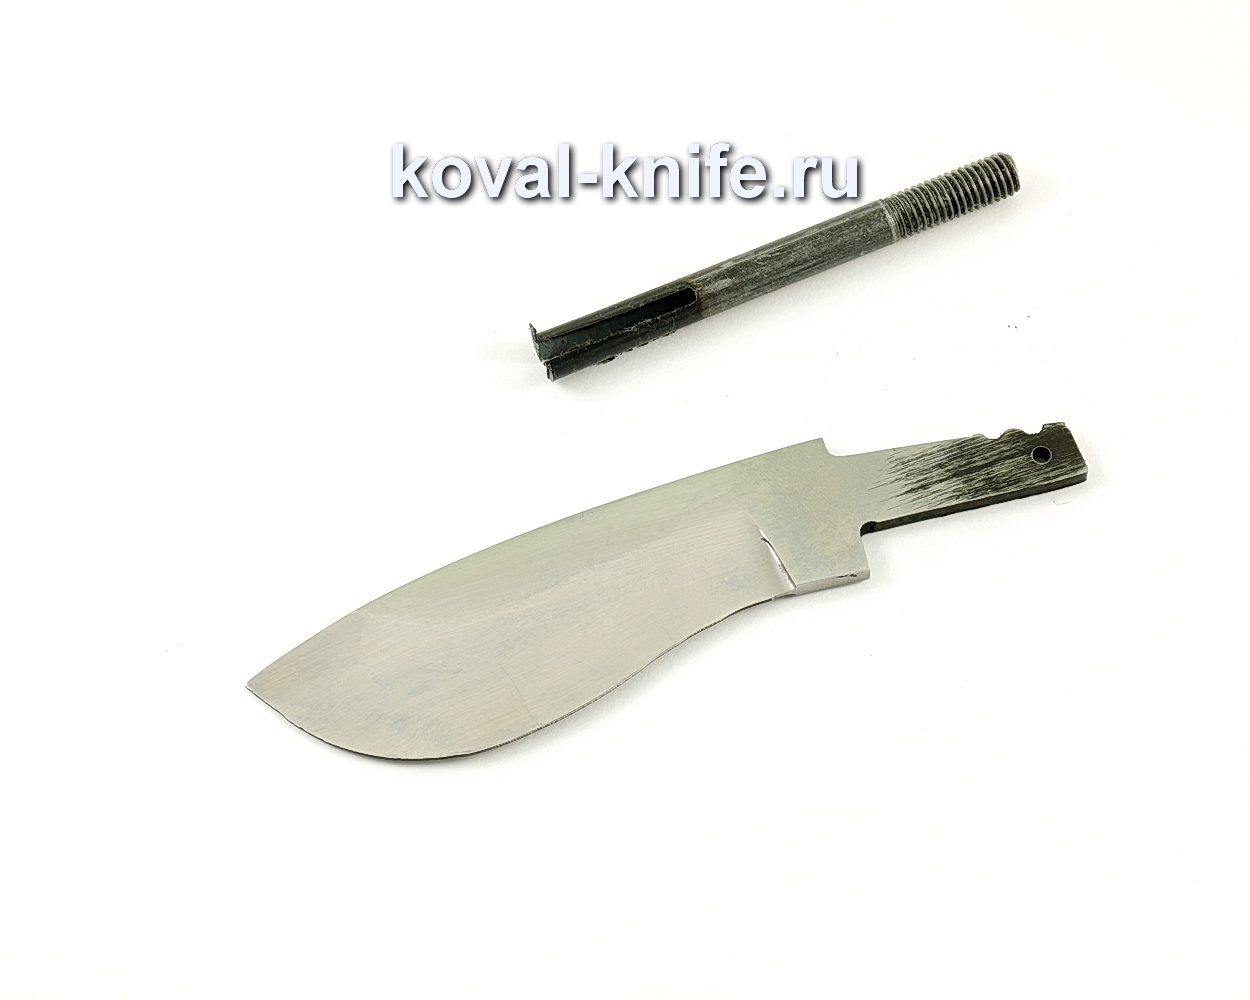 Клинок для ножа Носорог (кованая сталь 95Х18)